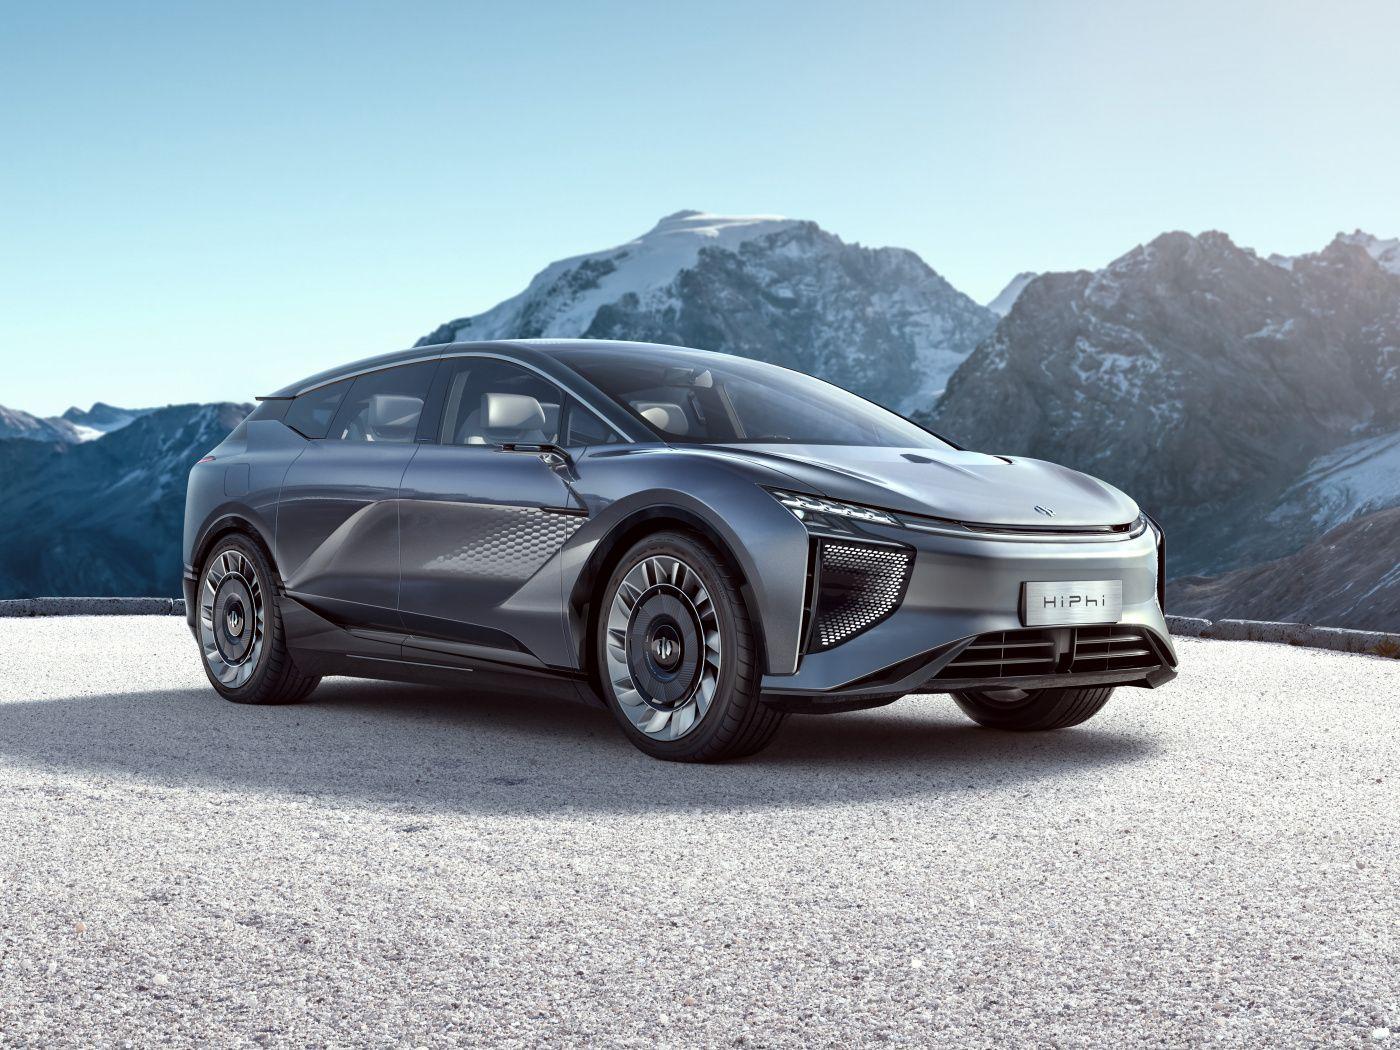 1400x1050 Car, HiPhi 1 2020, Electric car wallpaper